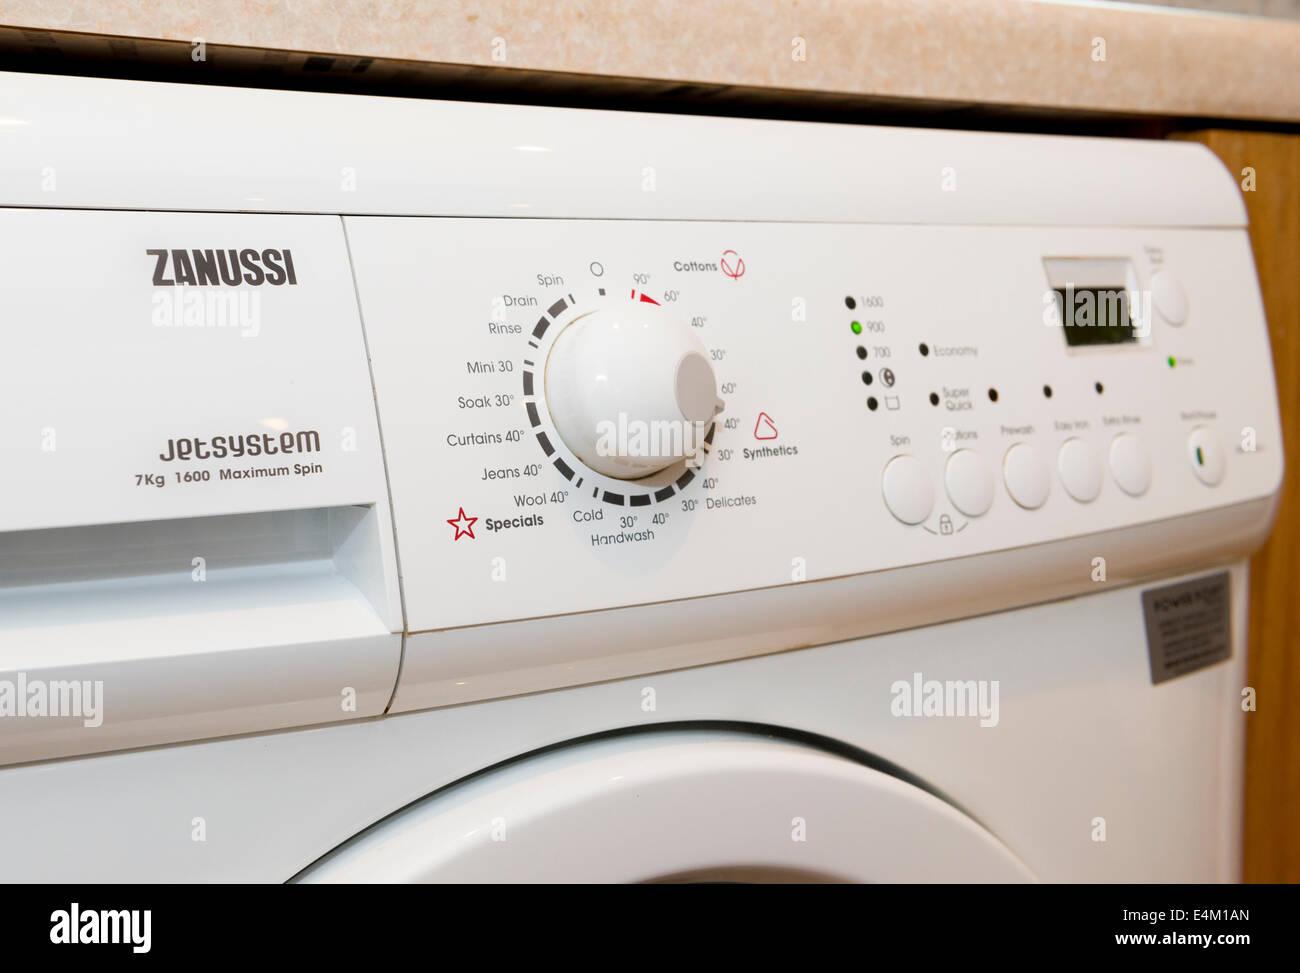 Washing Machine Controls : Washing machine blowing fuse at end of program diynot forums